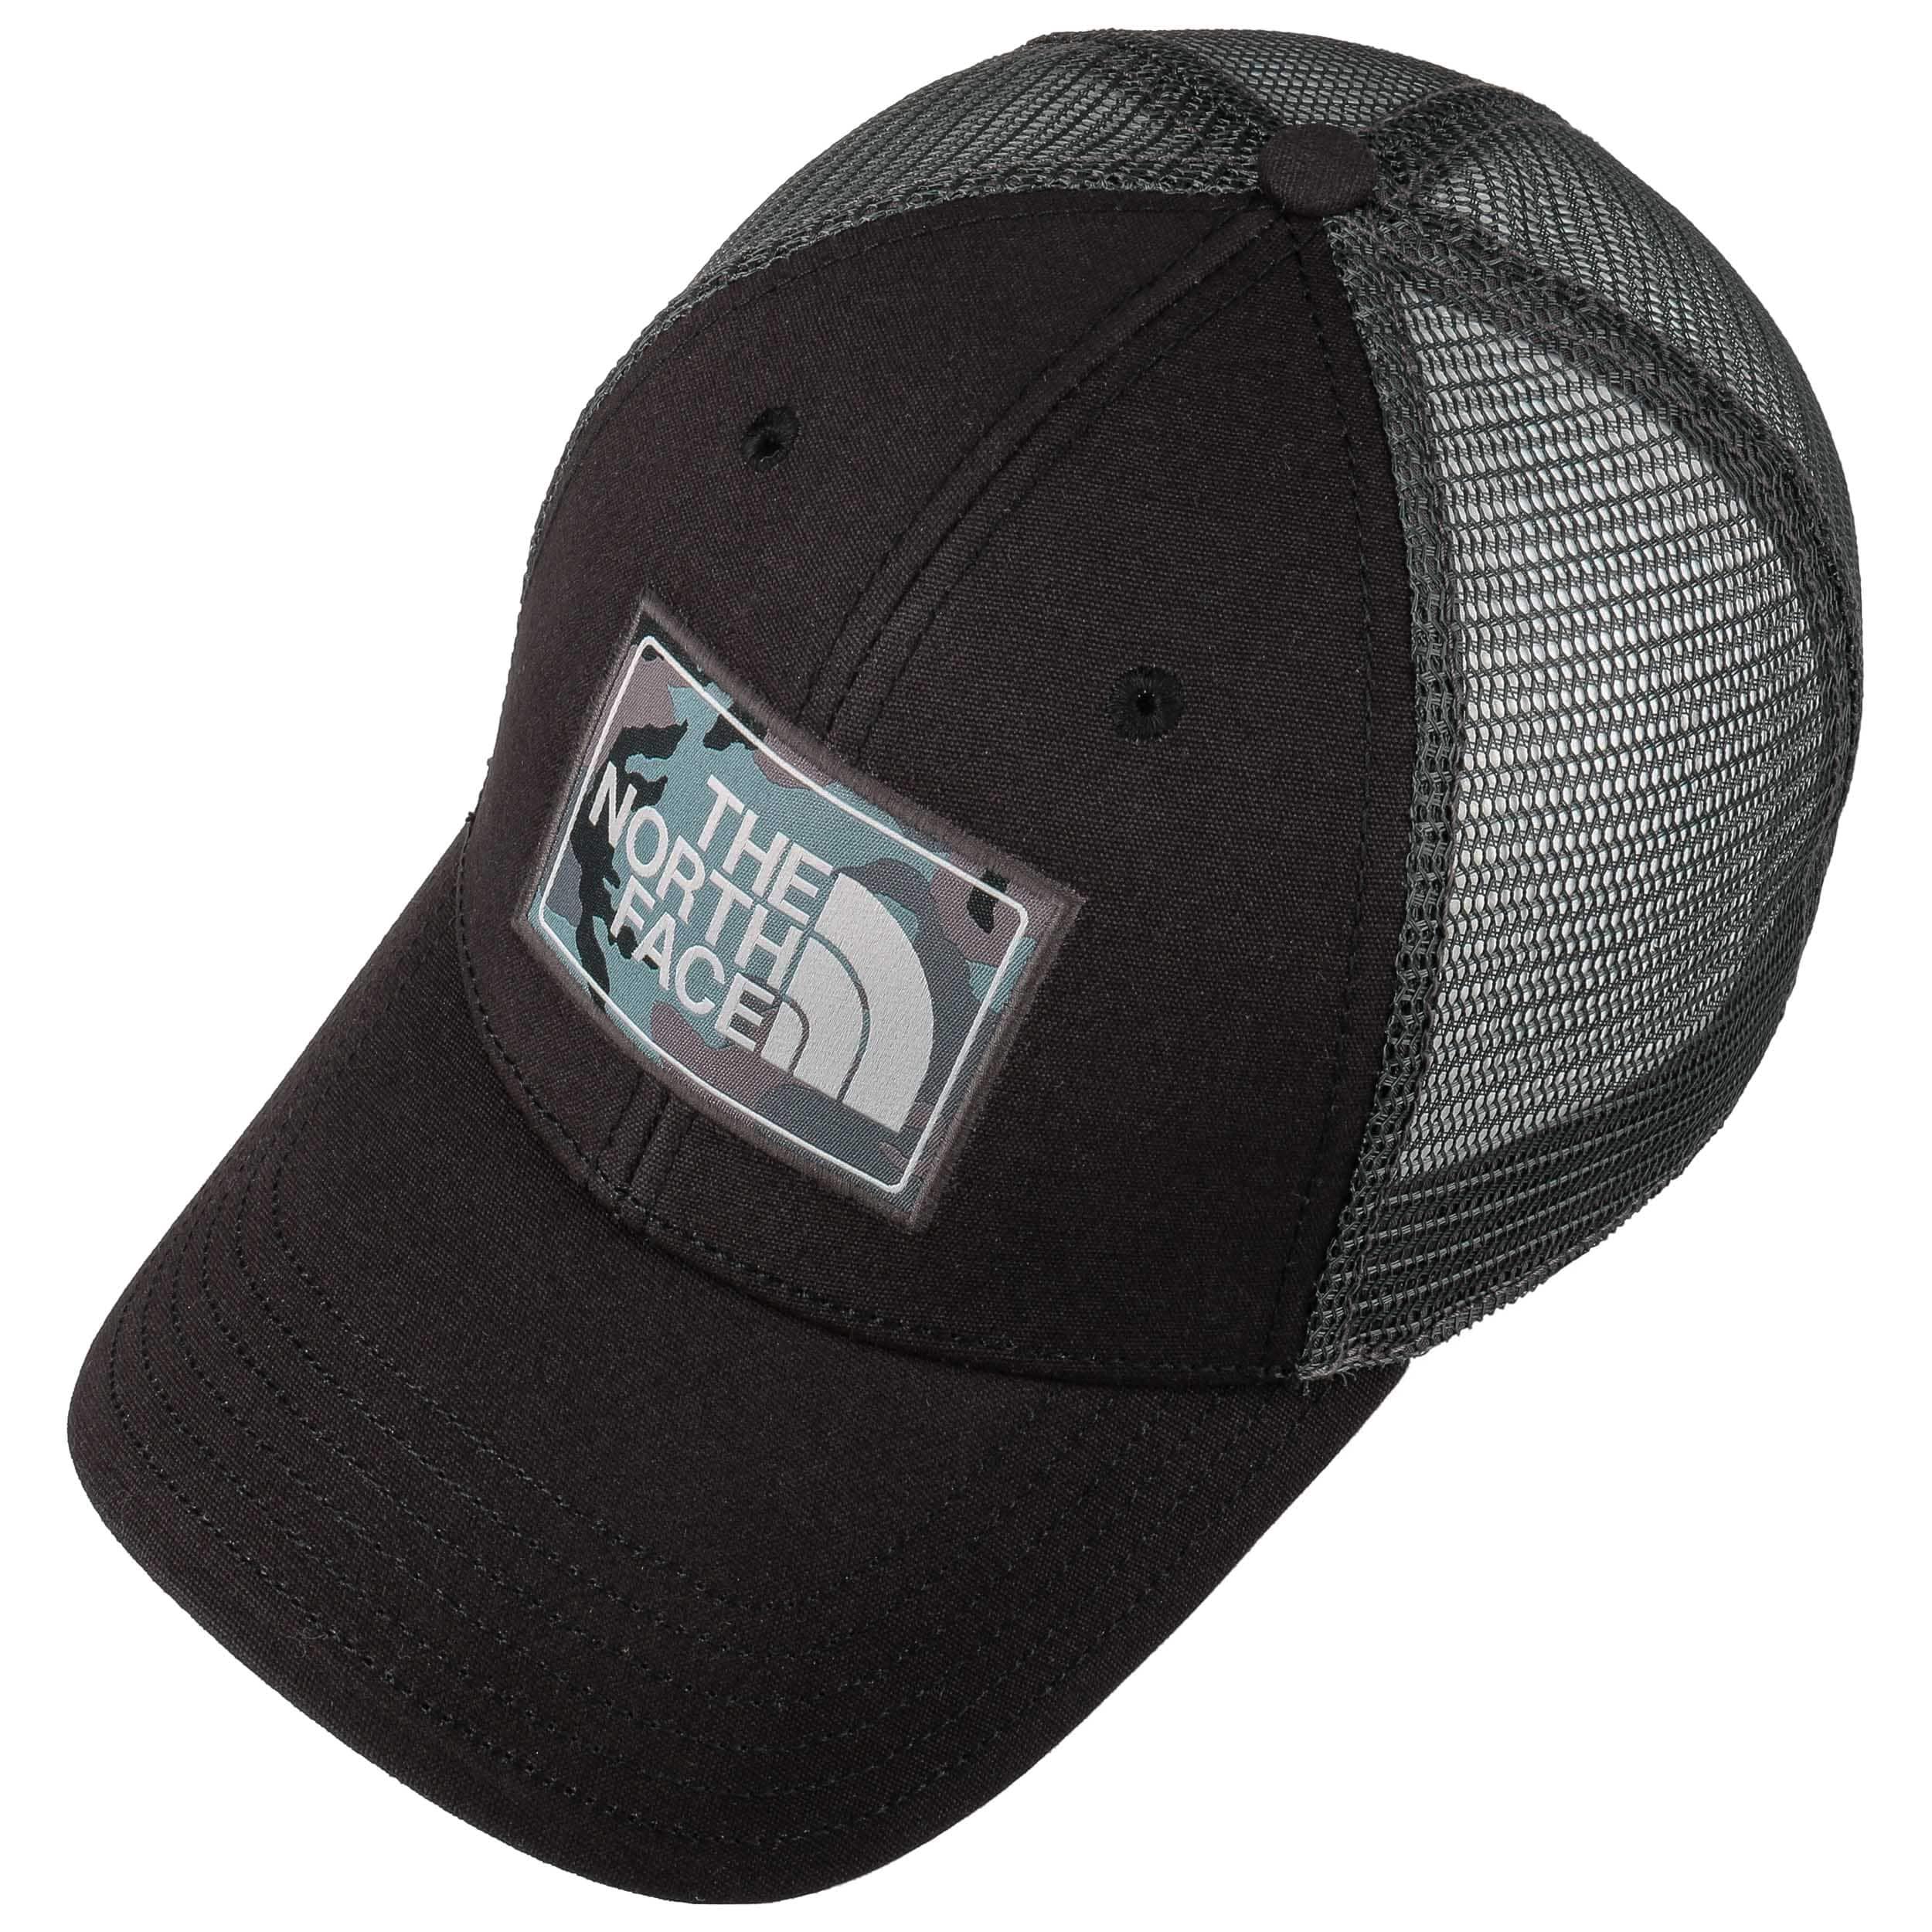 a5975ea751b74 ... Mudder Trucker Cap by The North Face - black-grey 1 ...